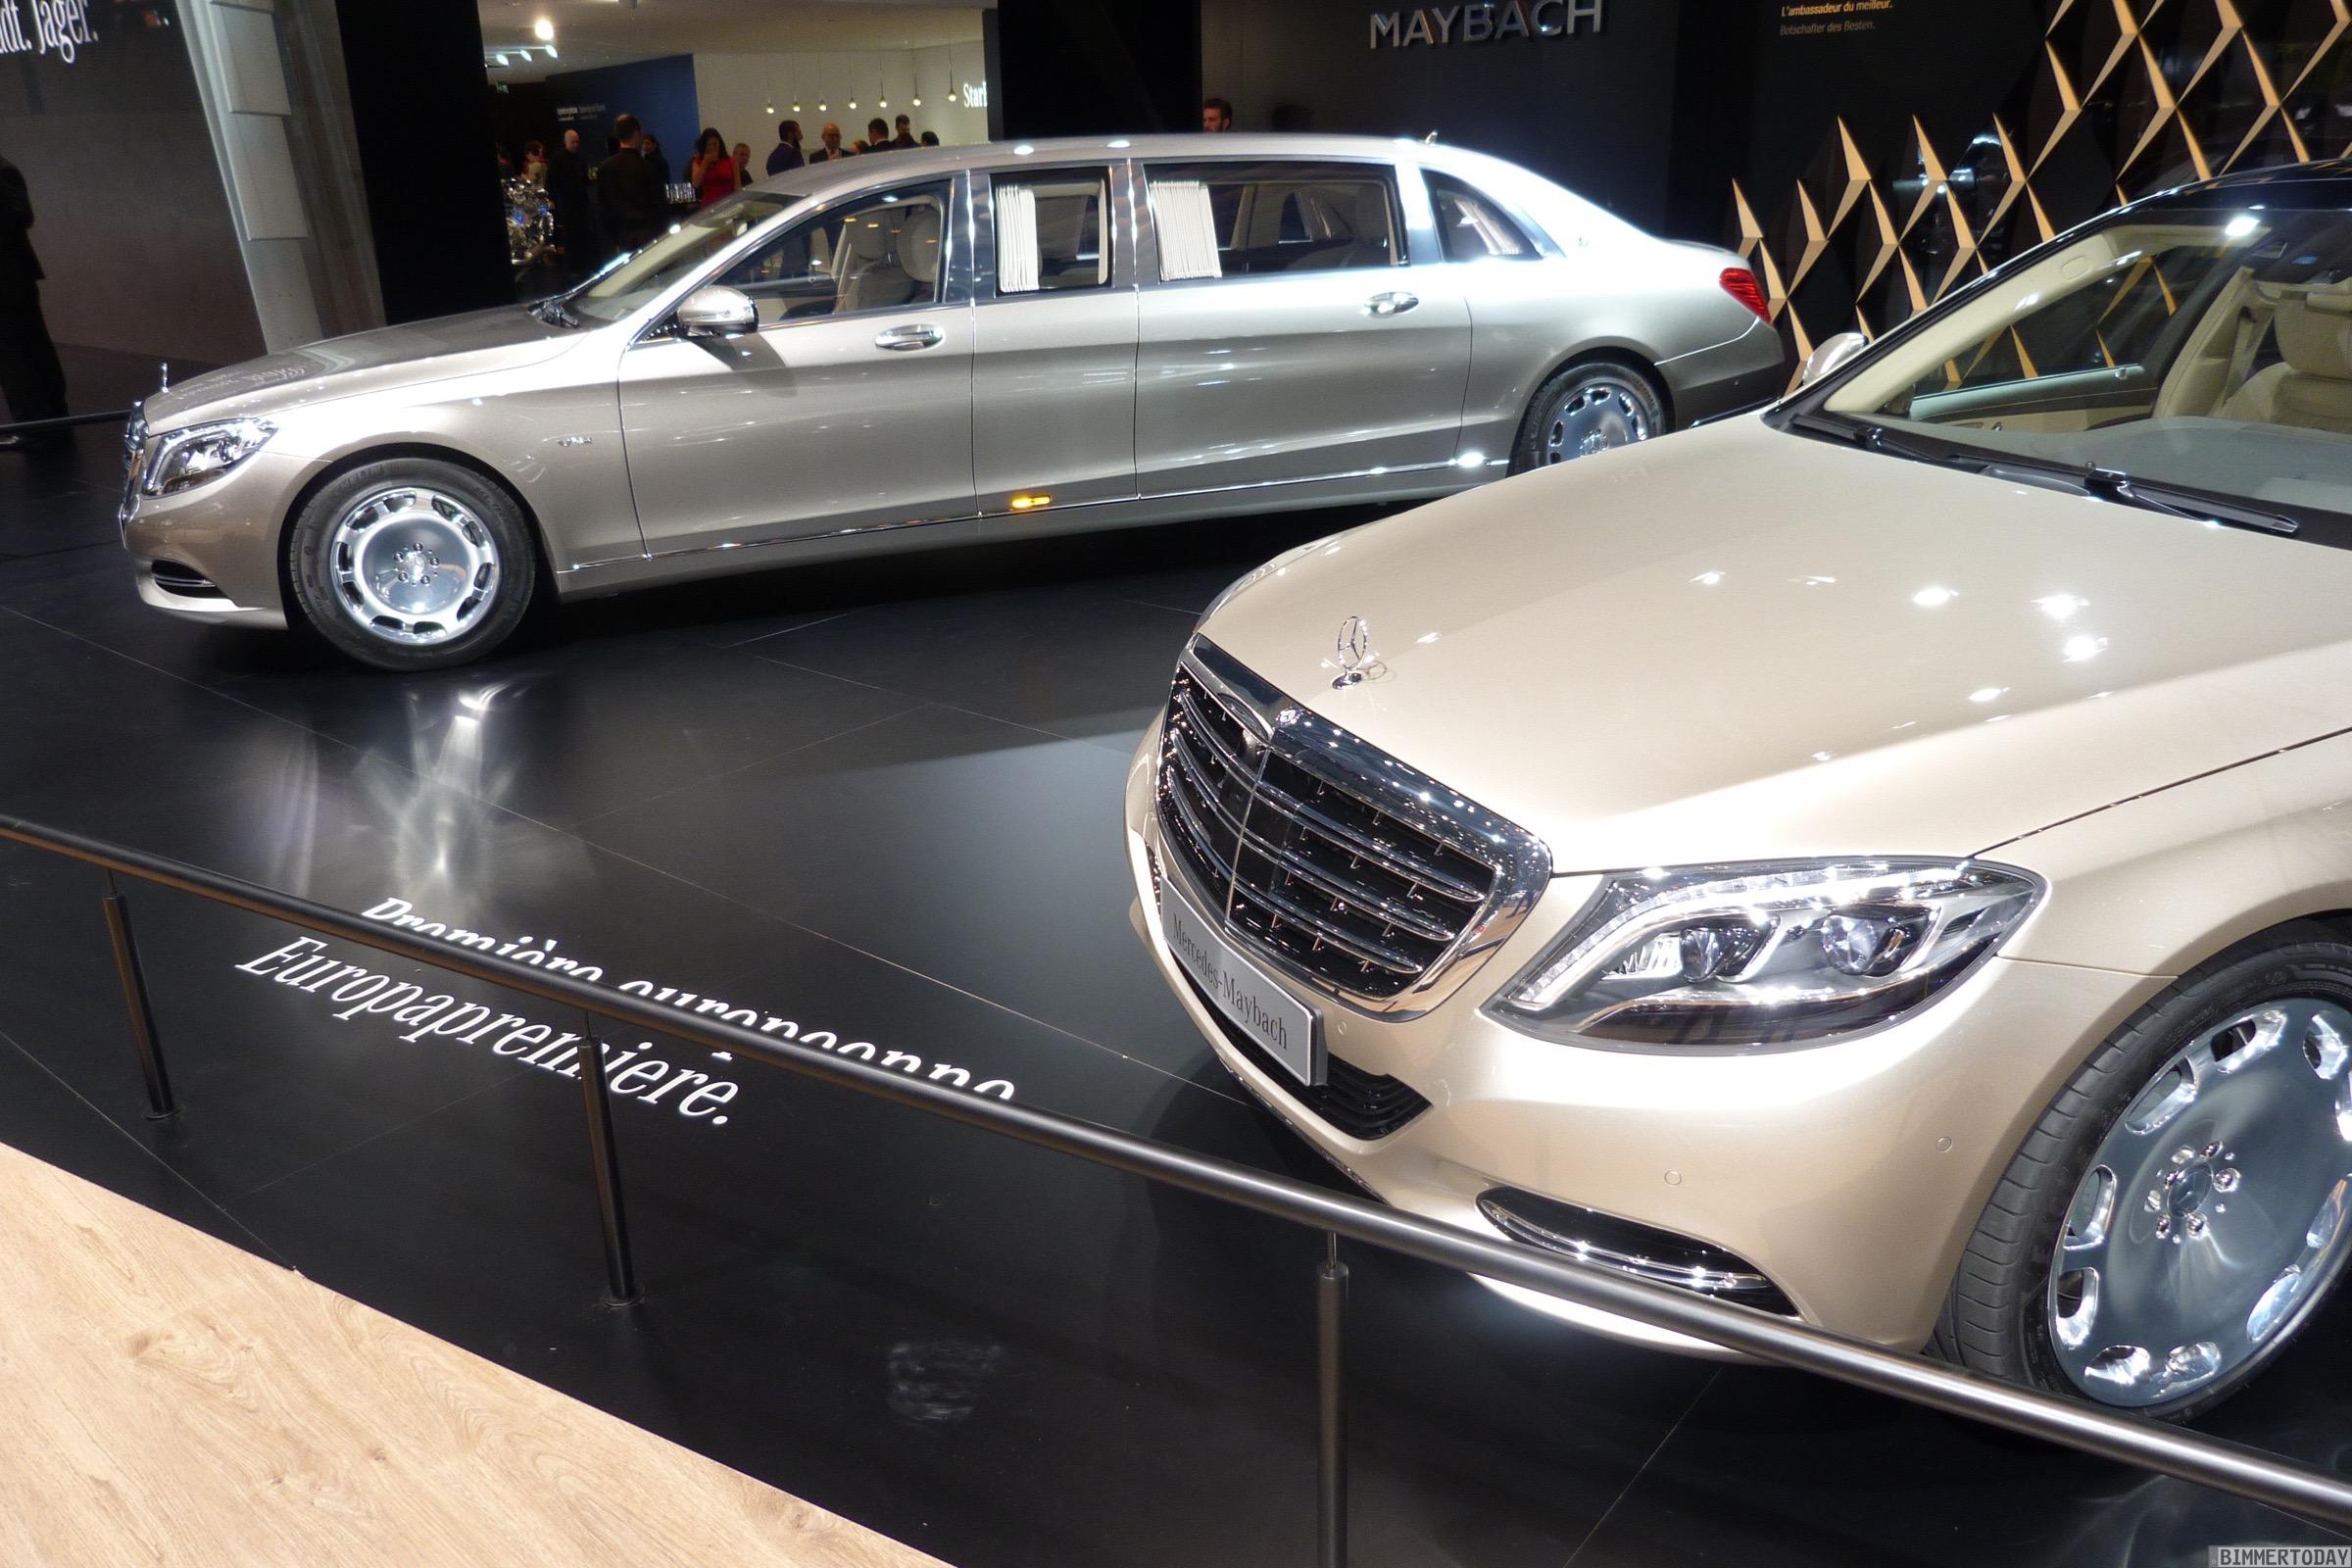 Mercedses Maybach S Klasse Pullman 2015 Genf Autosalon Live 01